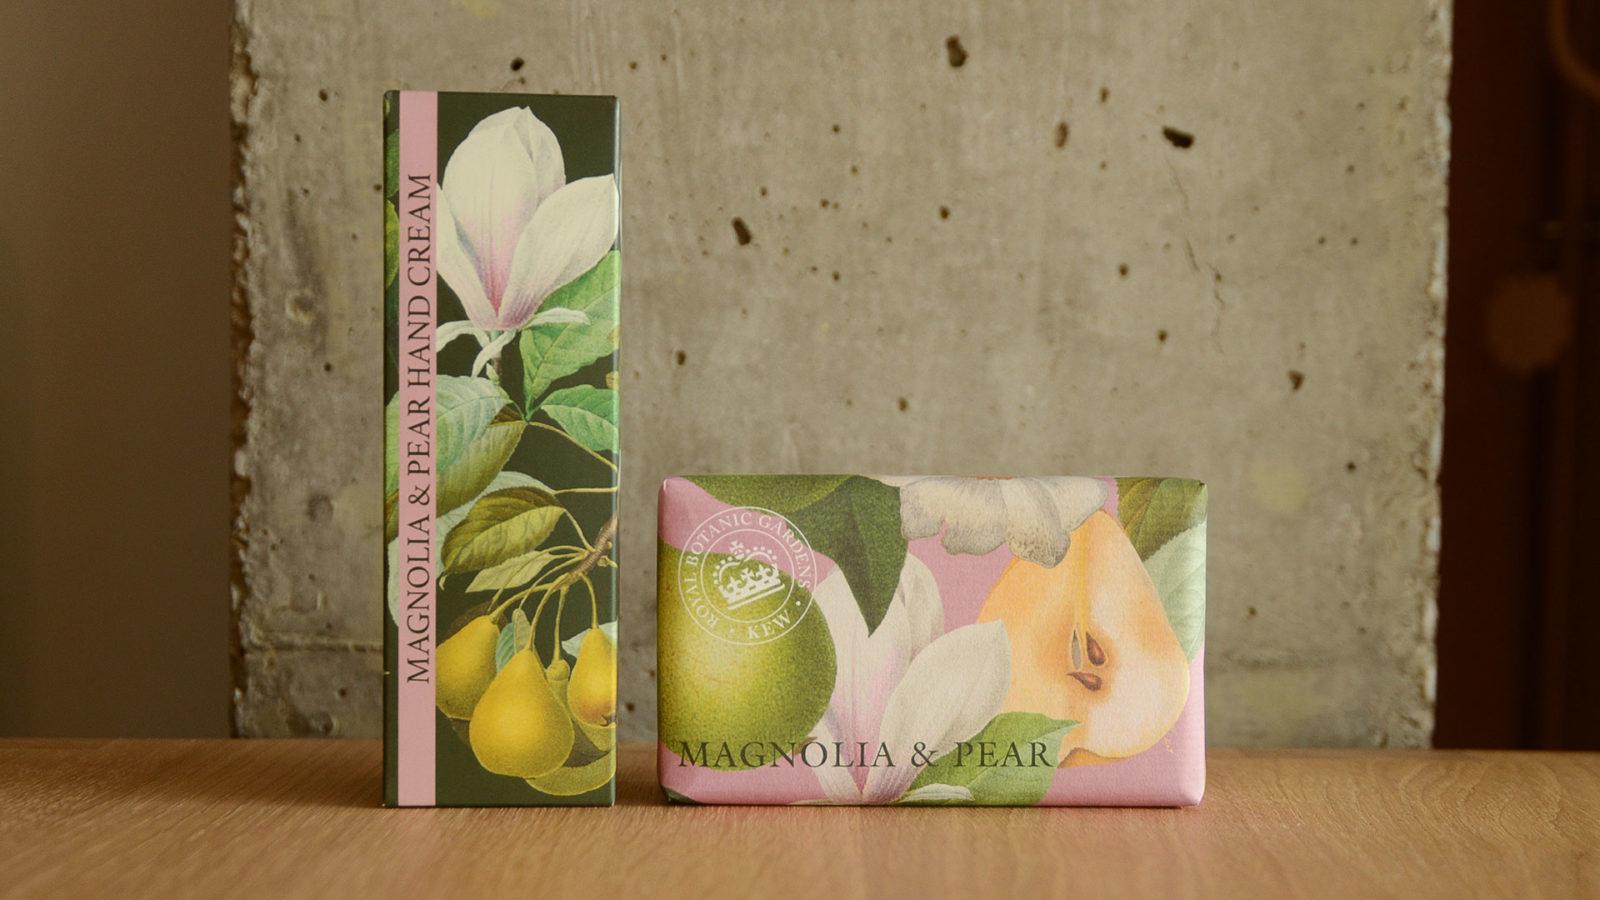 Kew Gardens hand care set magnolia & pear